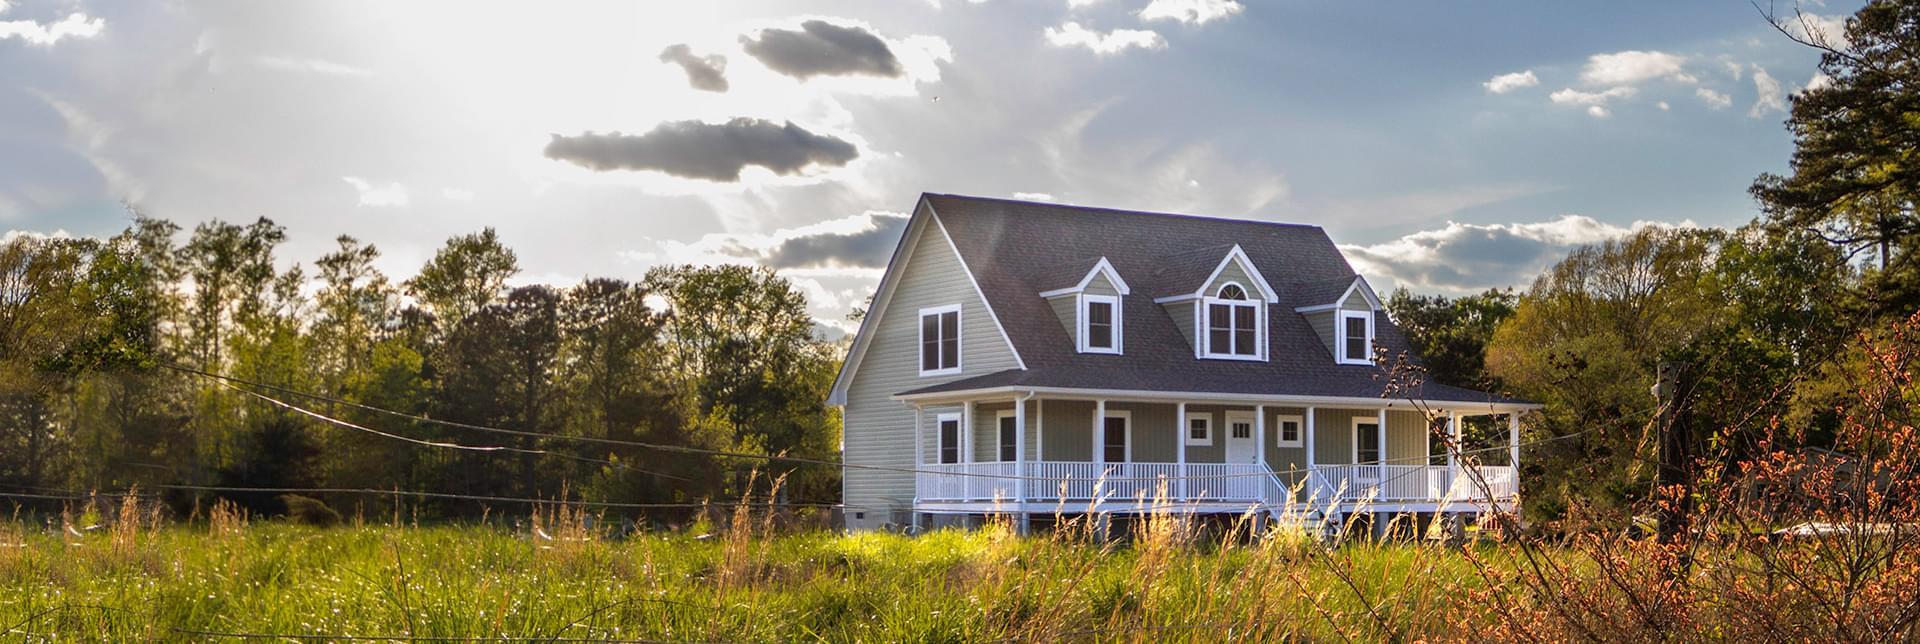 New Homes in Mecklenburg County VA